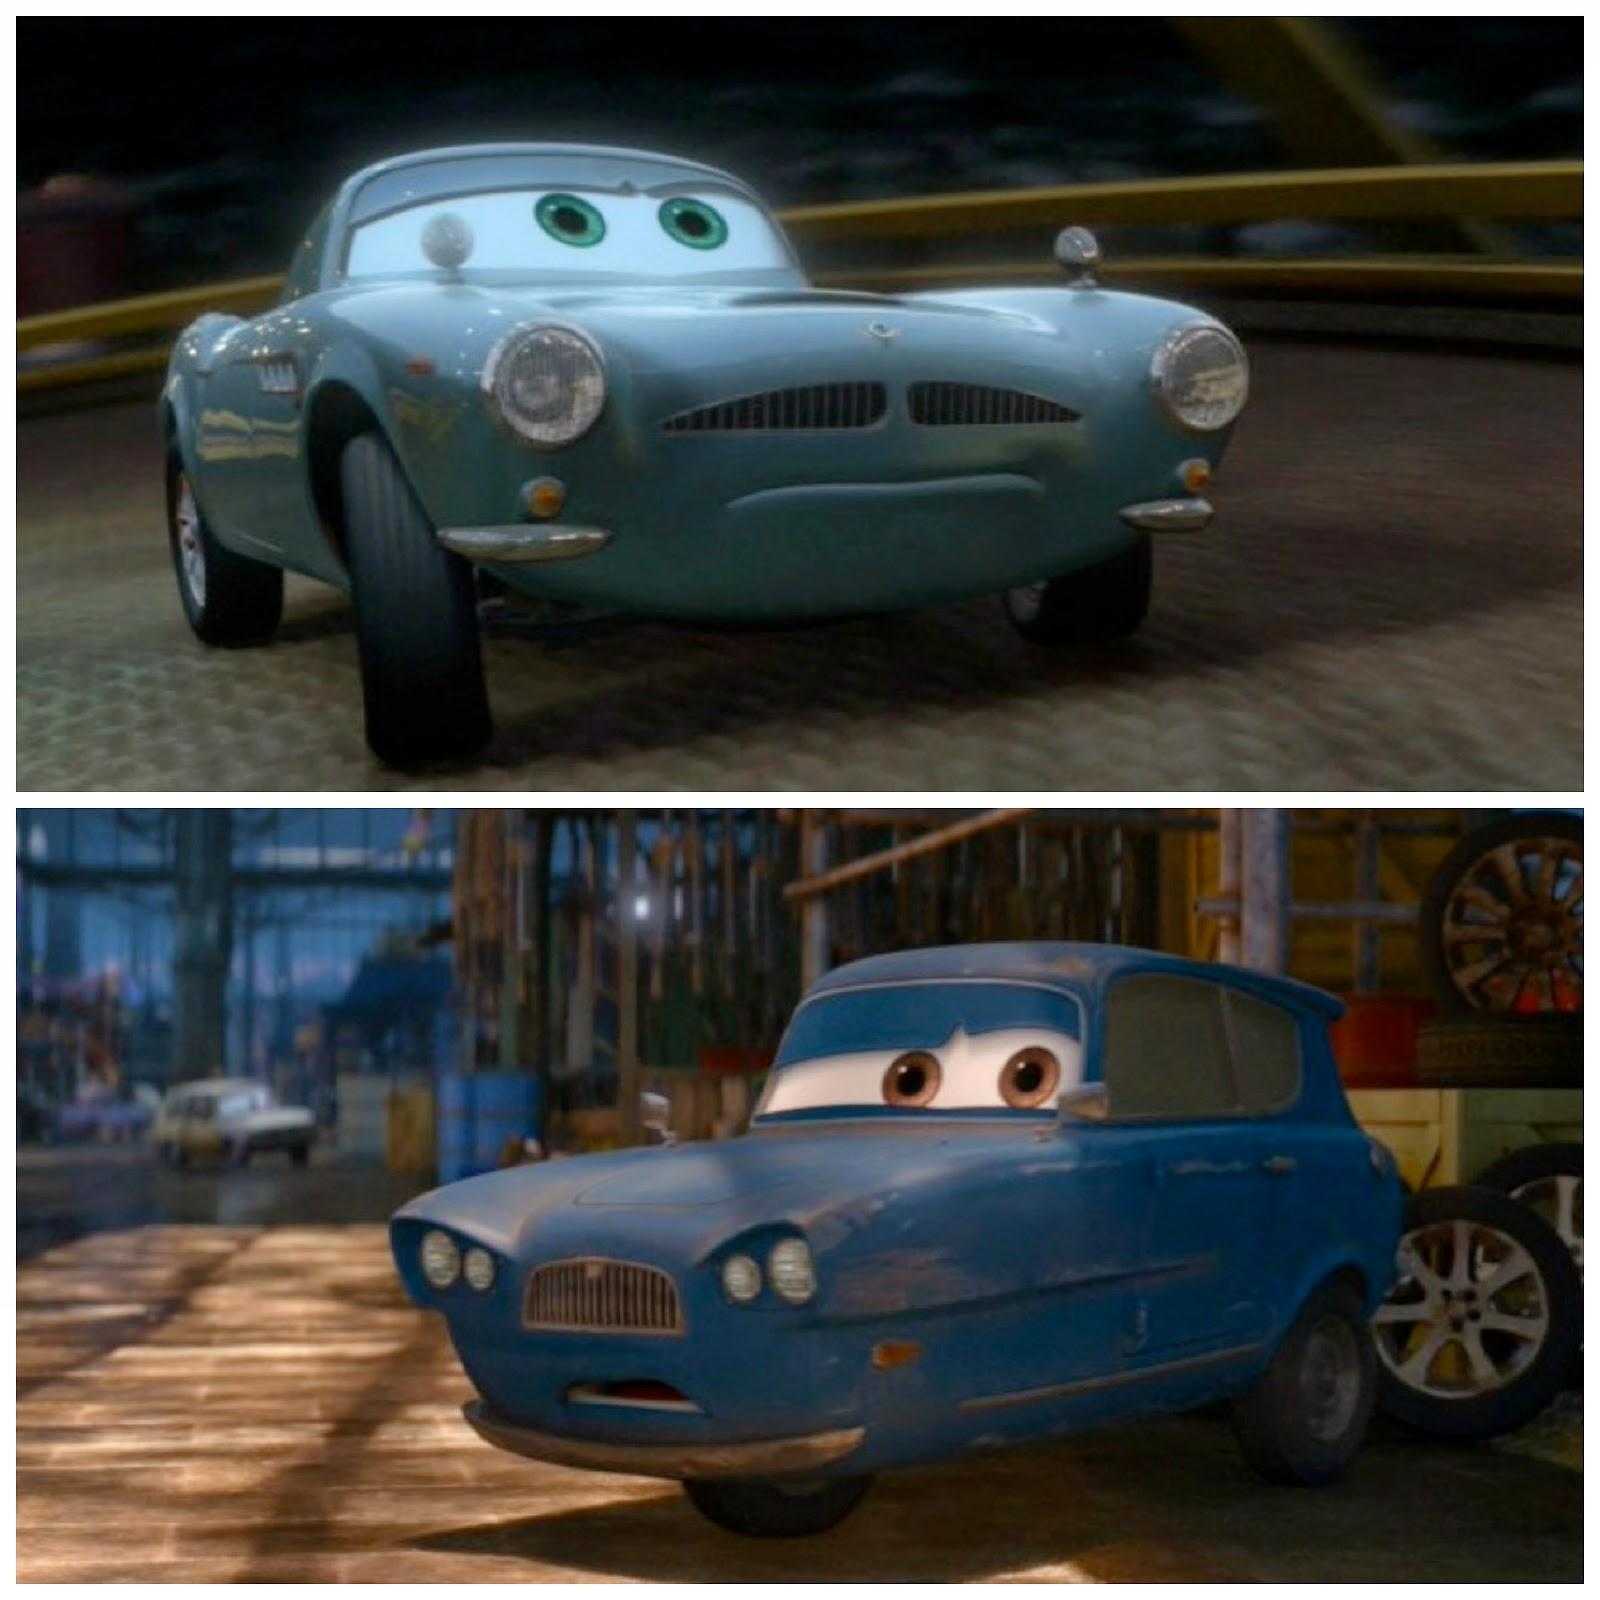 dan the pixar fan cars 2 finn mcmissile and tomber